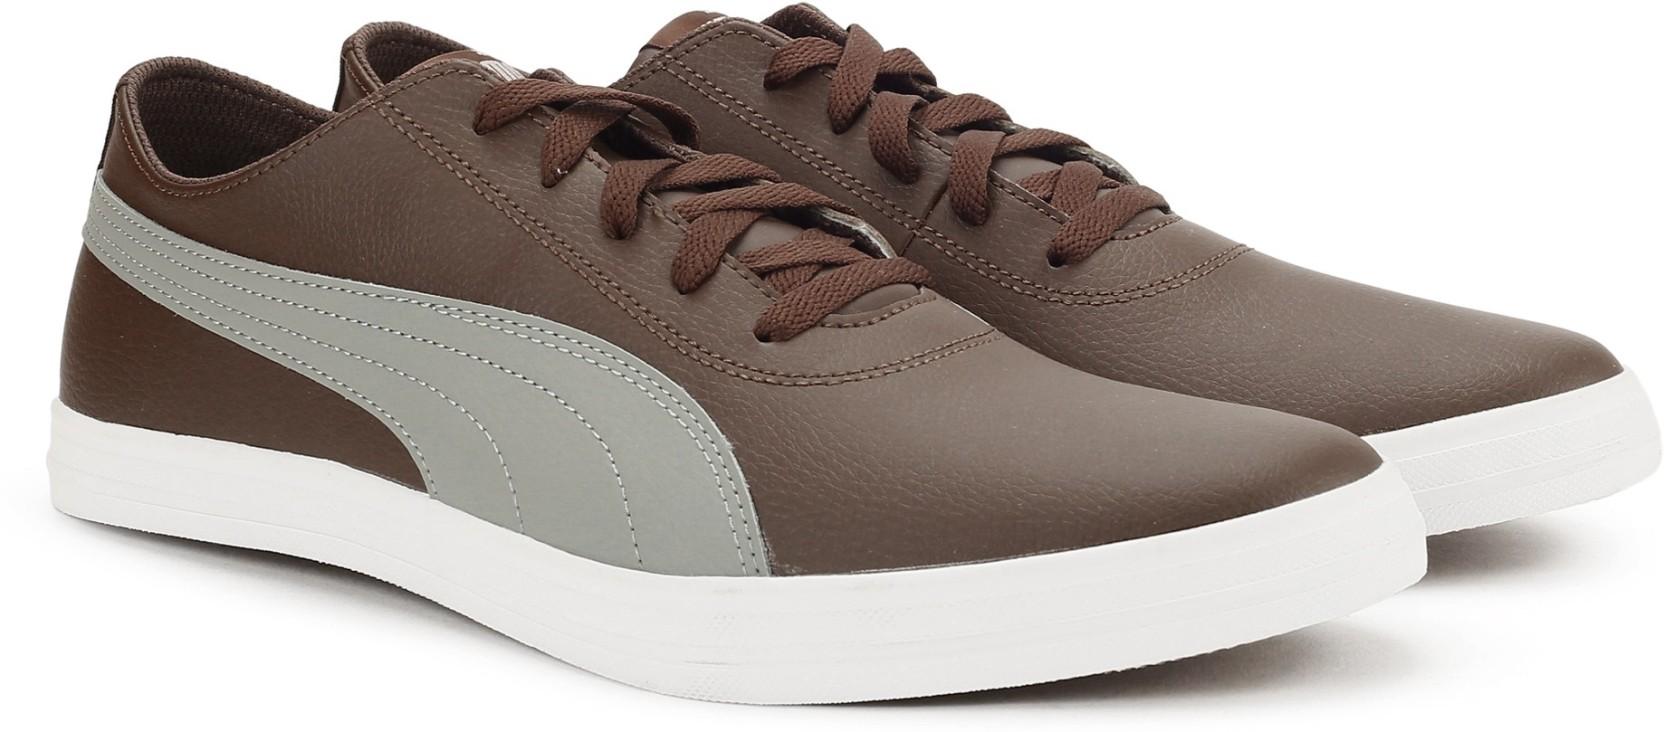 99eb02037989f5 Puma Urban SL IDP Sneakers For Men - Buy Chestnut-Rock Ridge Color ...